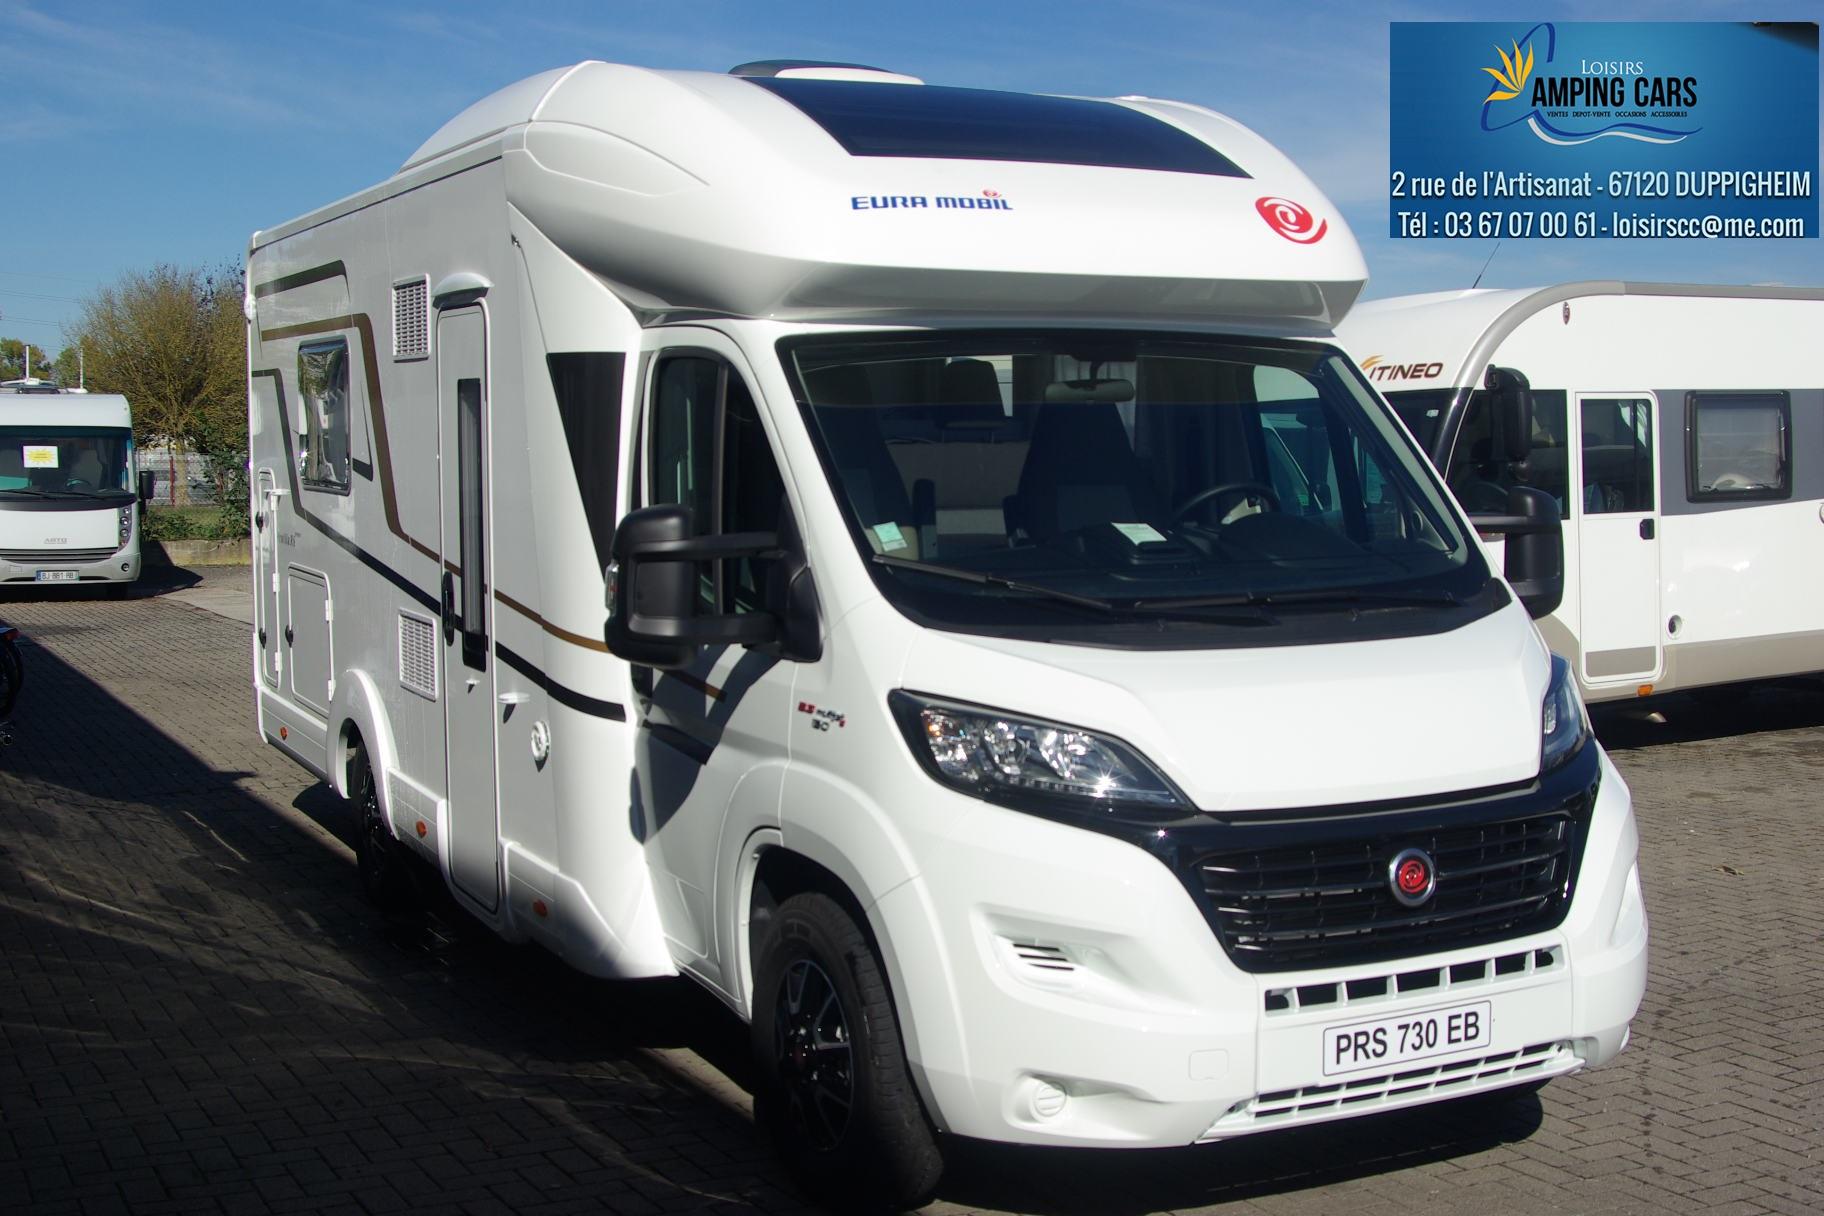 eura mobil profila rs 730 eb neuf de 2018 fiat camping car en vente duppigheim rhin 67. Black Bedroom Furniture Sets. Home Design Ideas